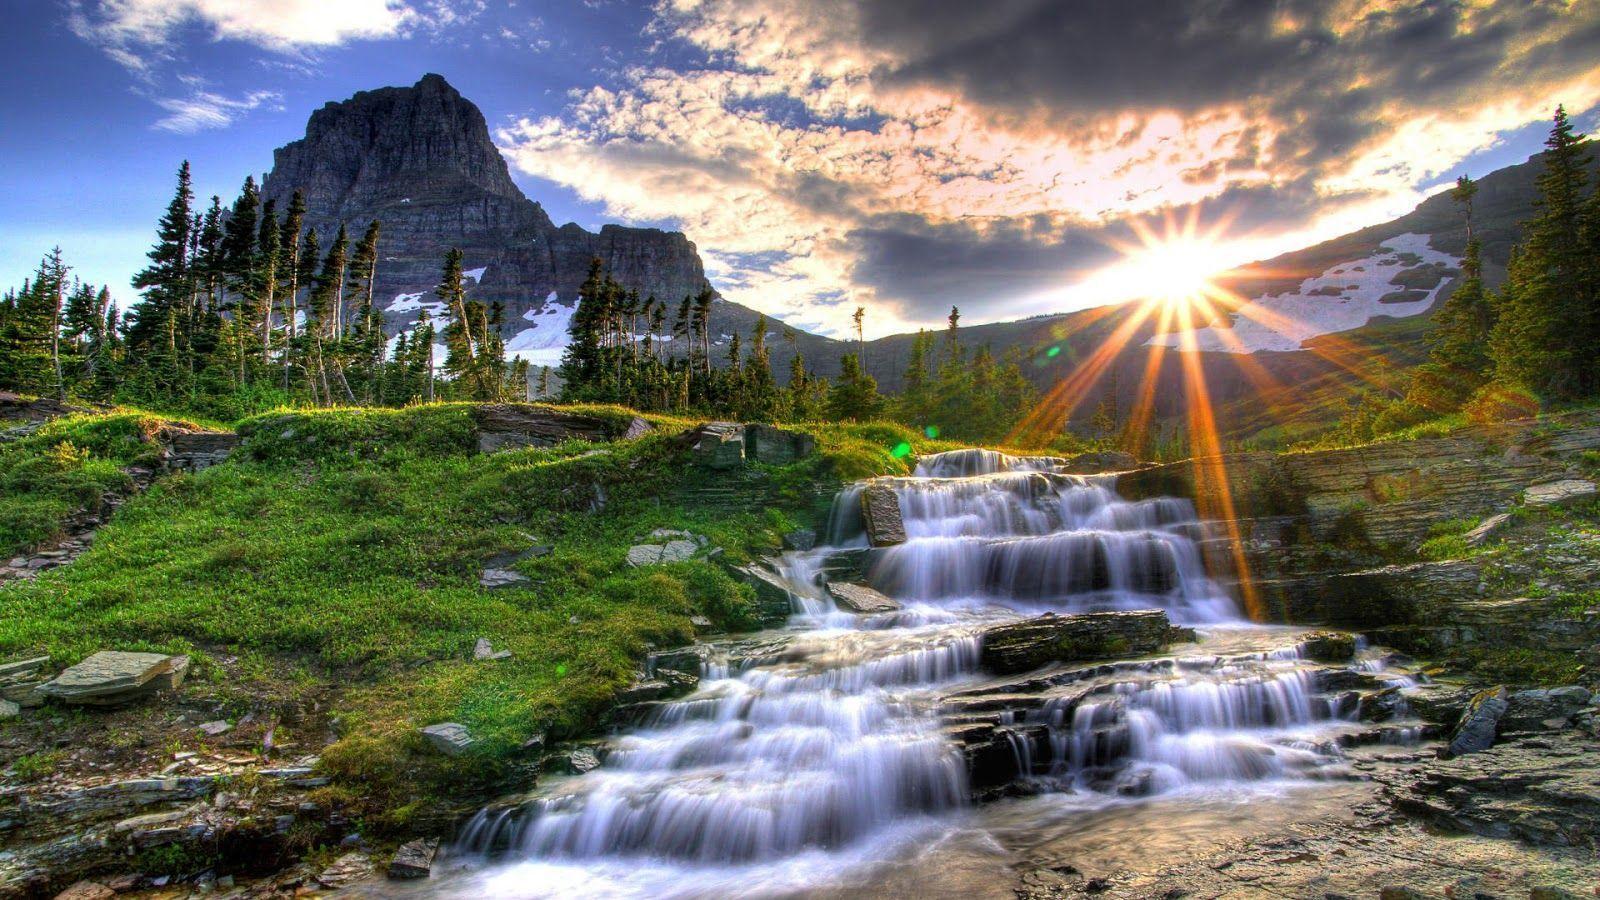 Hd Wallpaper Nature 1080p 19 In 2020 Waterfall